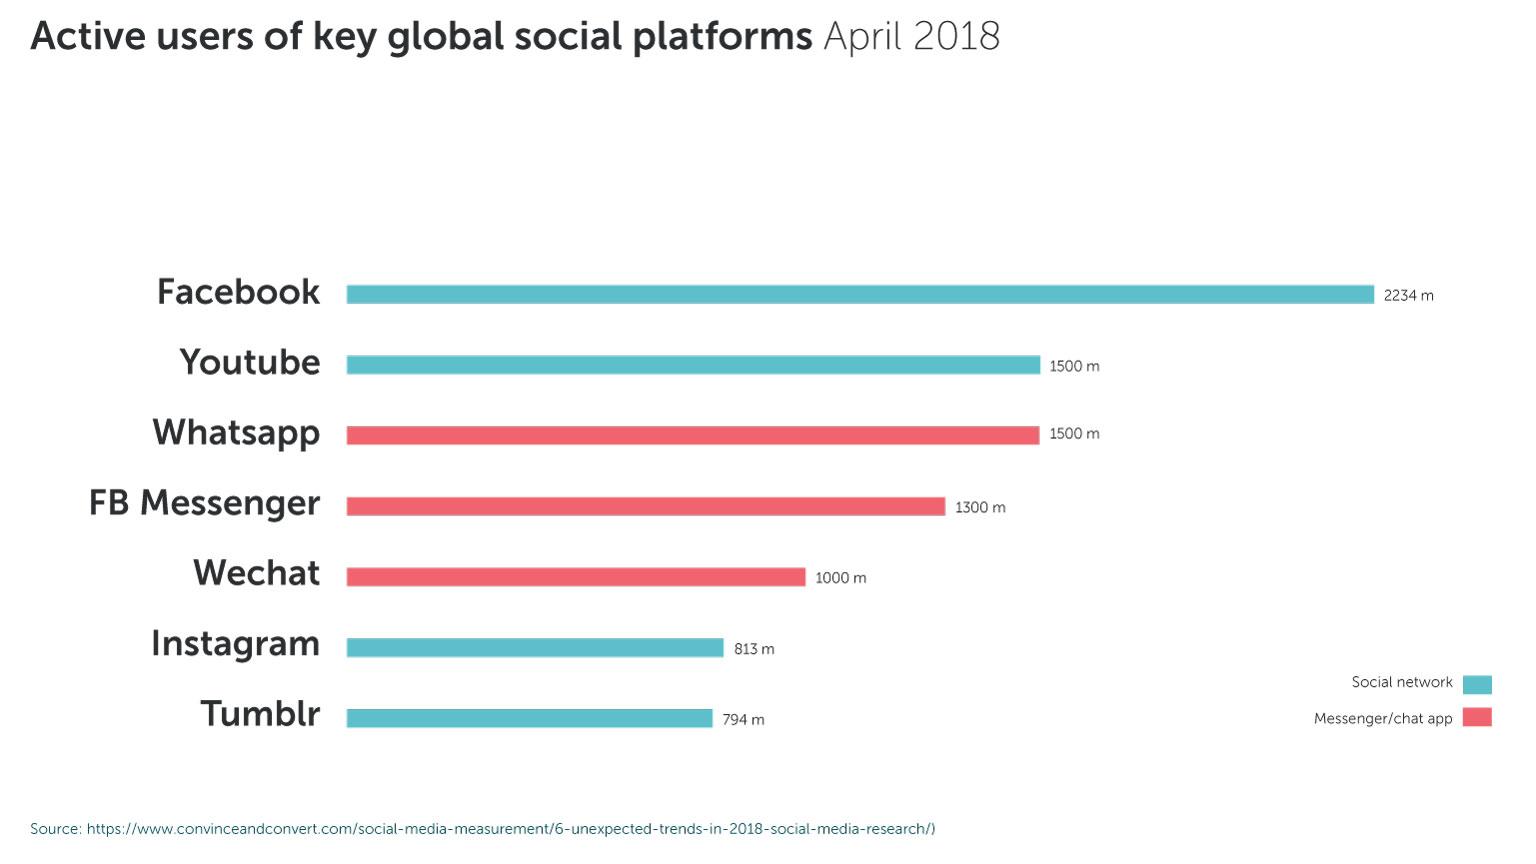 Active users key global social platforms